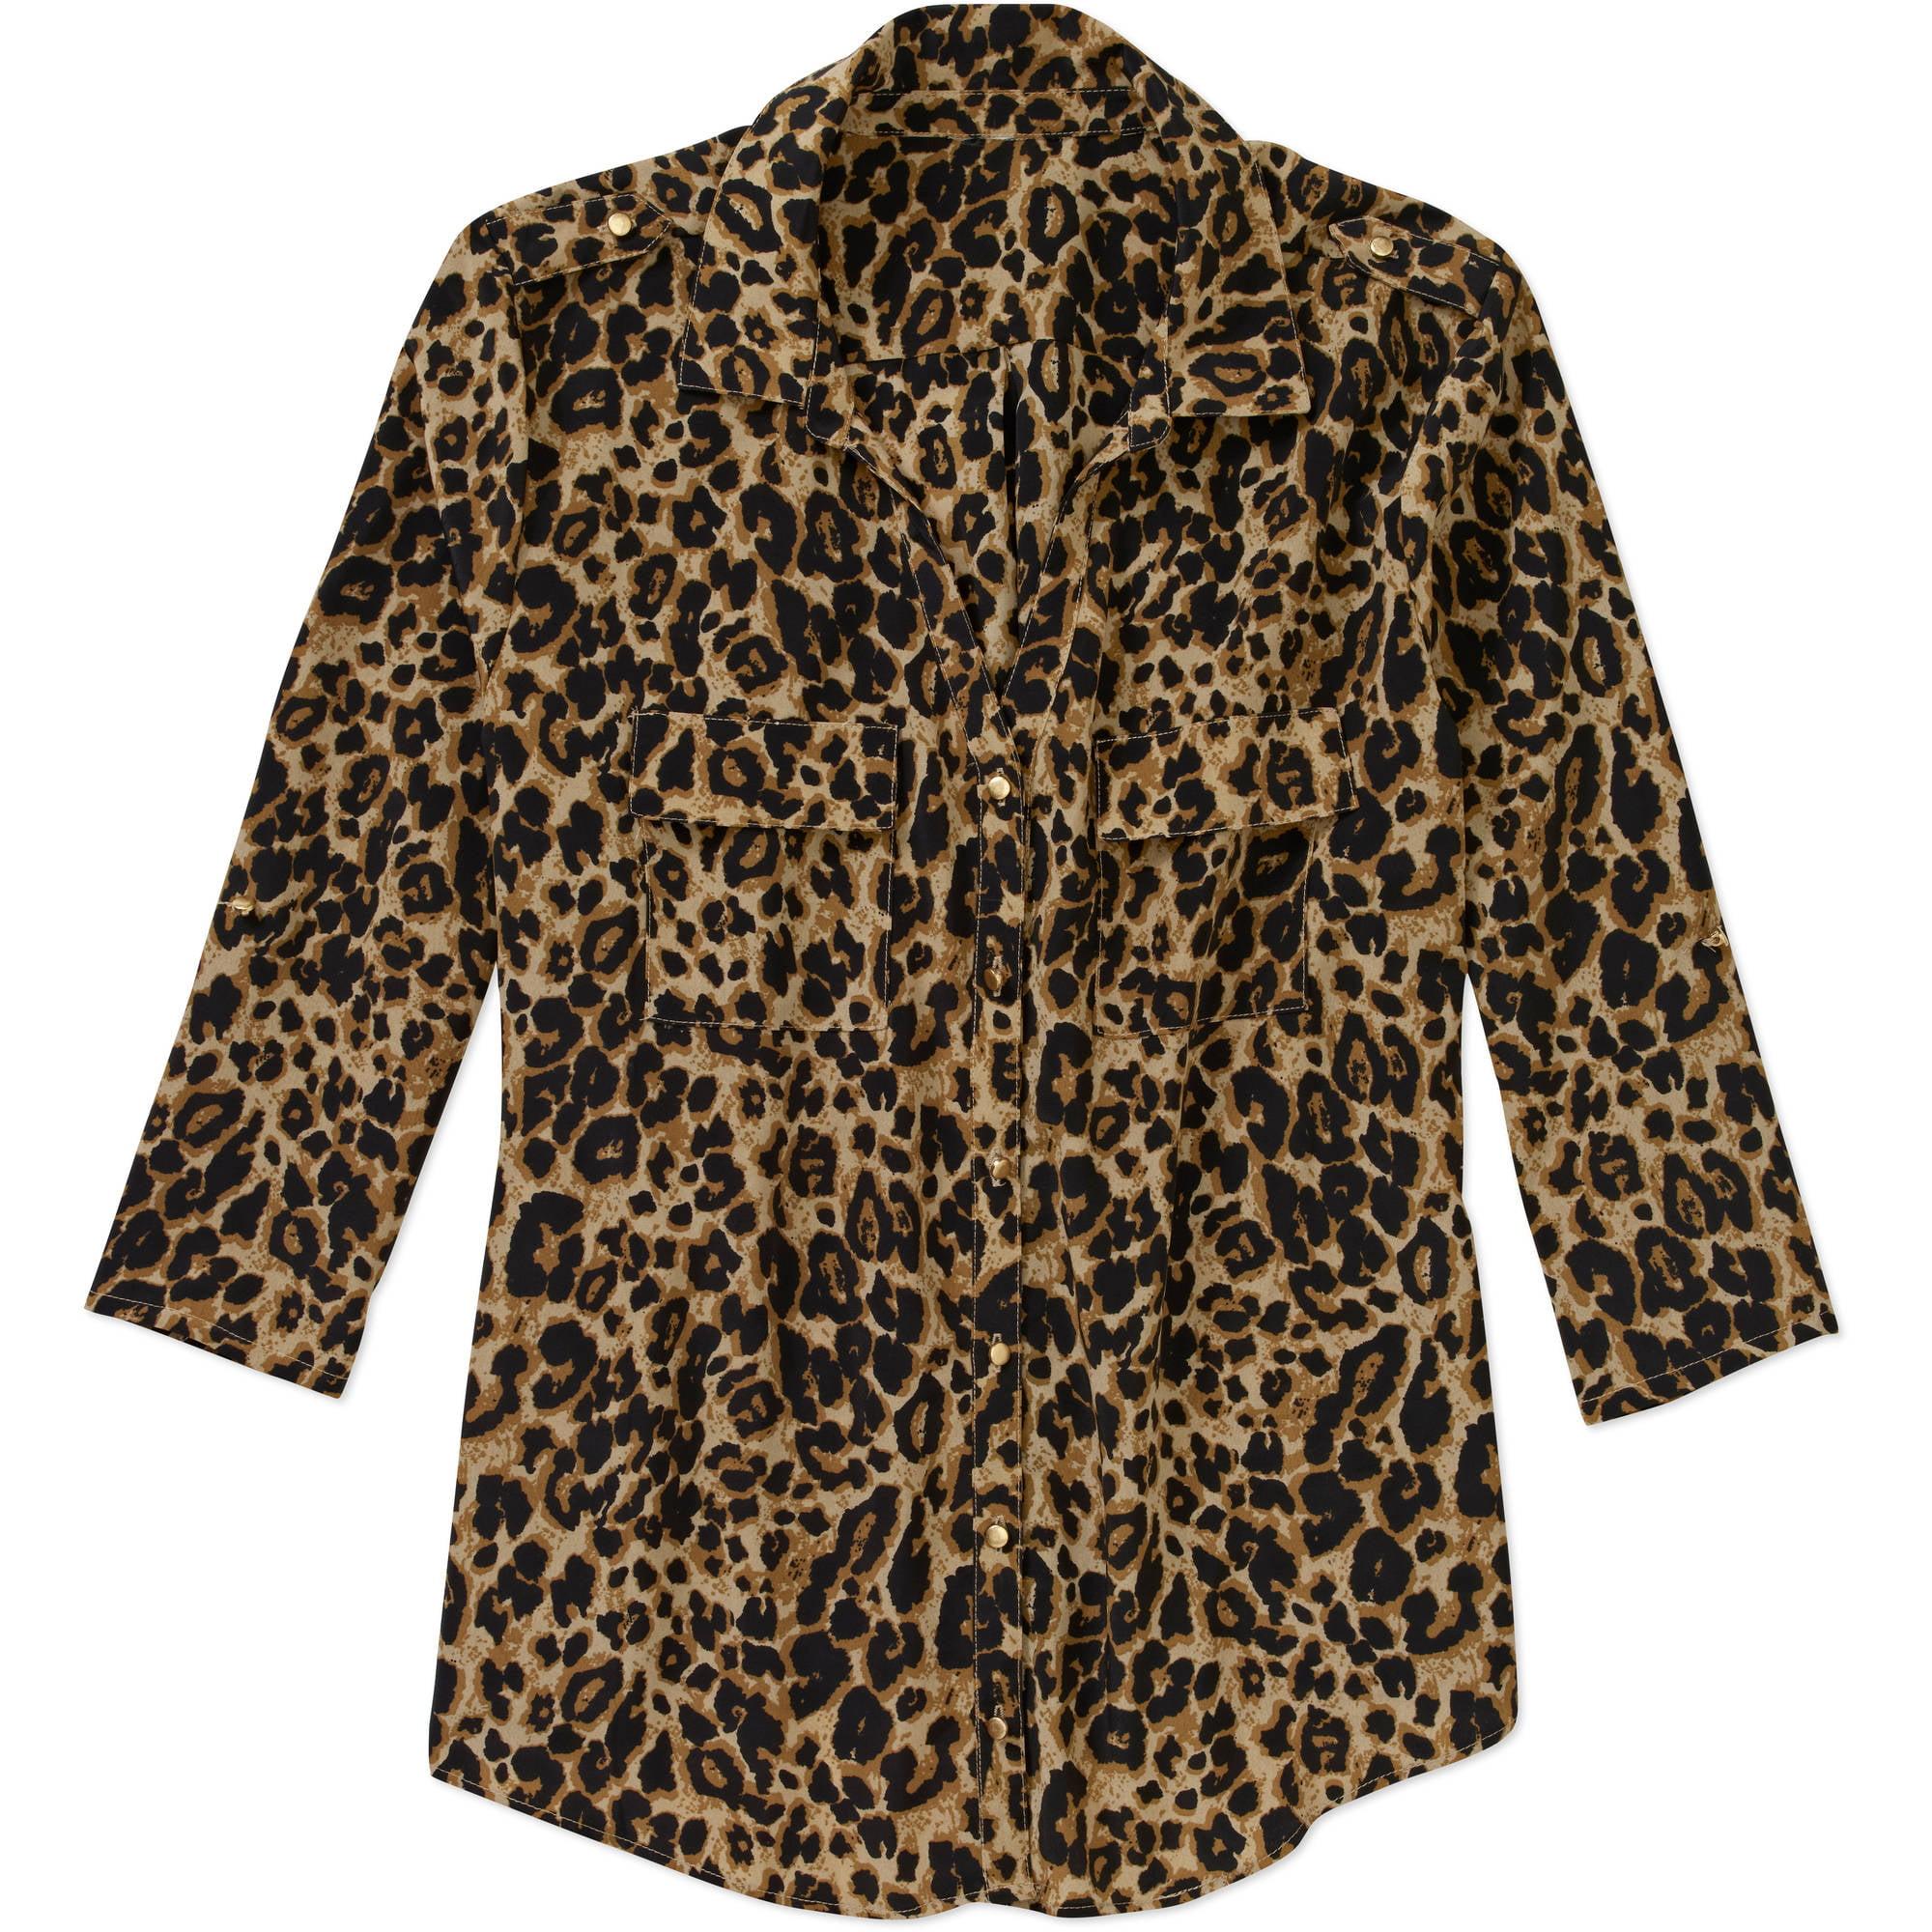 Women's Plus-Size Animal Print Shirt